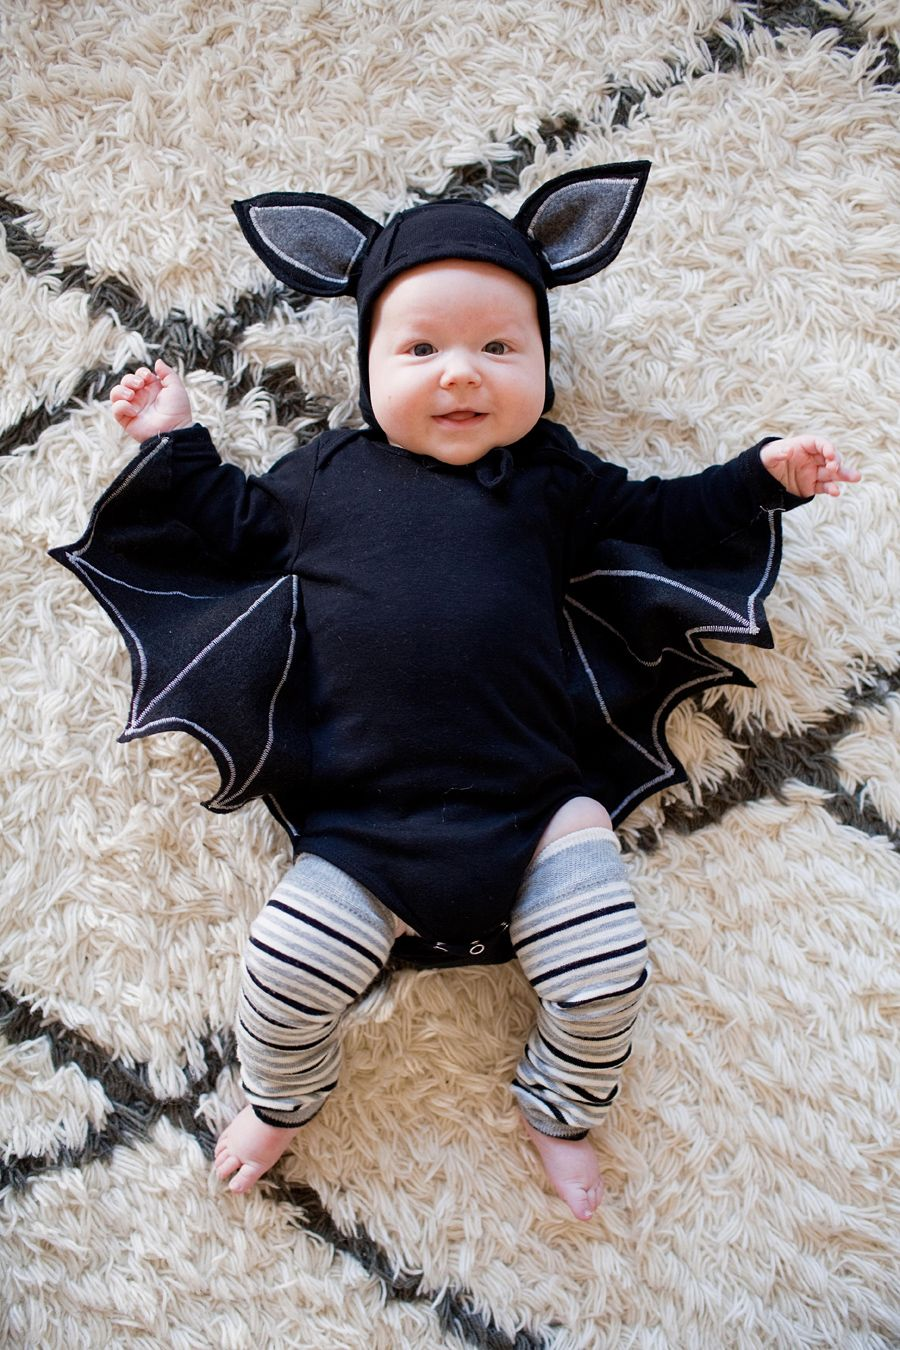 Cute DIY Baby Halloween Costume Ideas   Best Homemade Infant ...